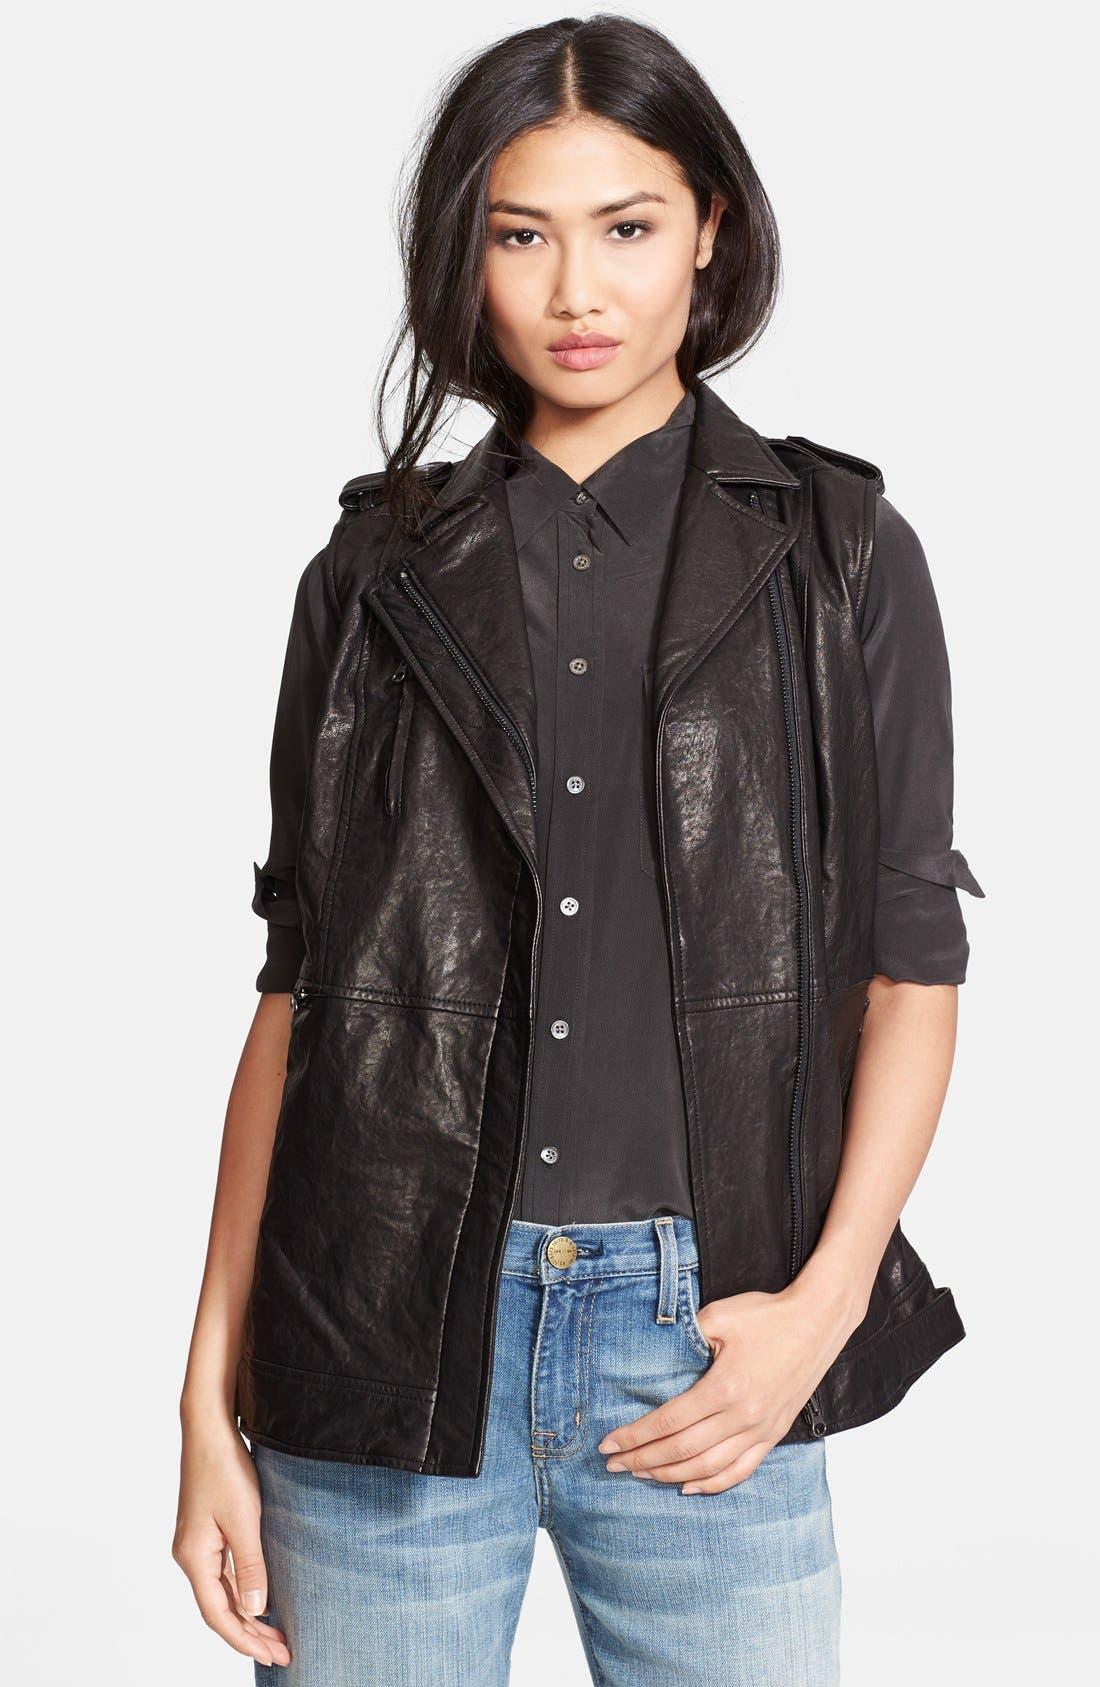 Alternate Image 1 Selected - Truth & Pride 'Studied' Leather Vest.